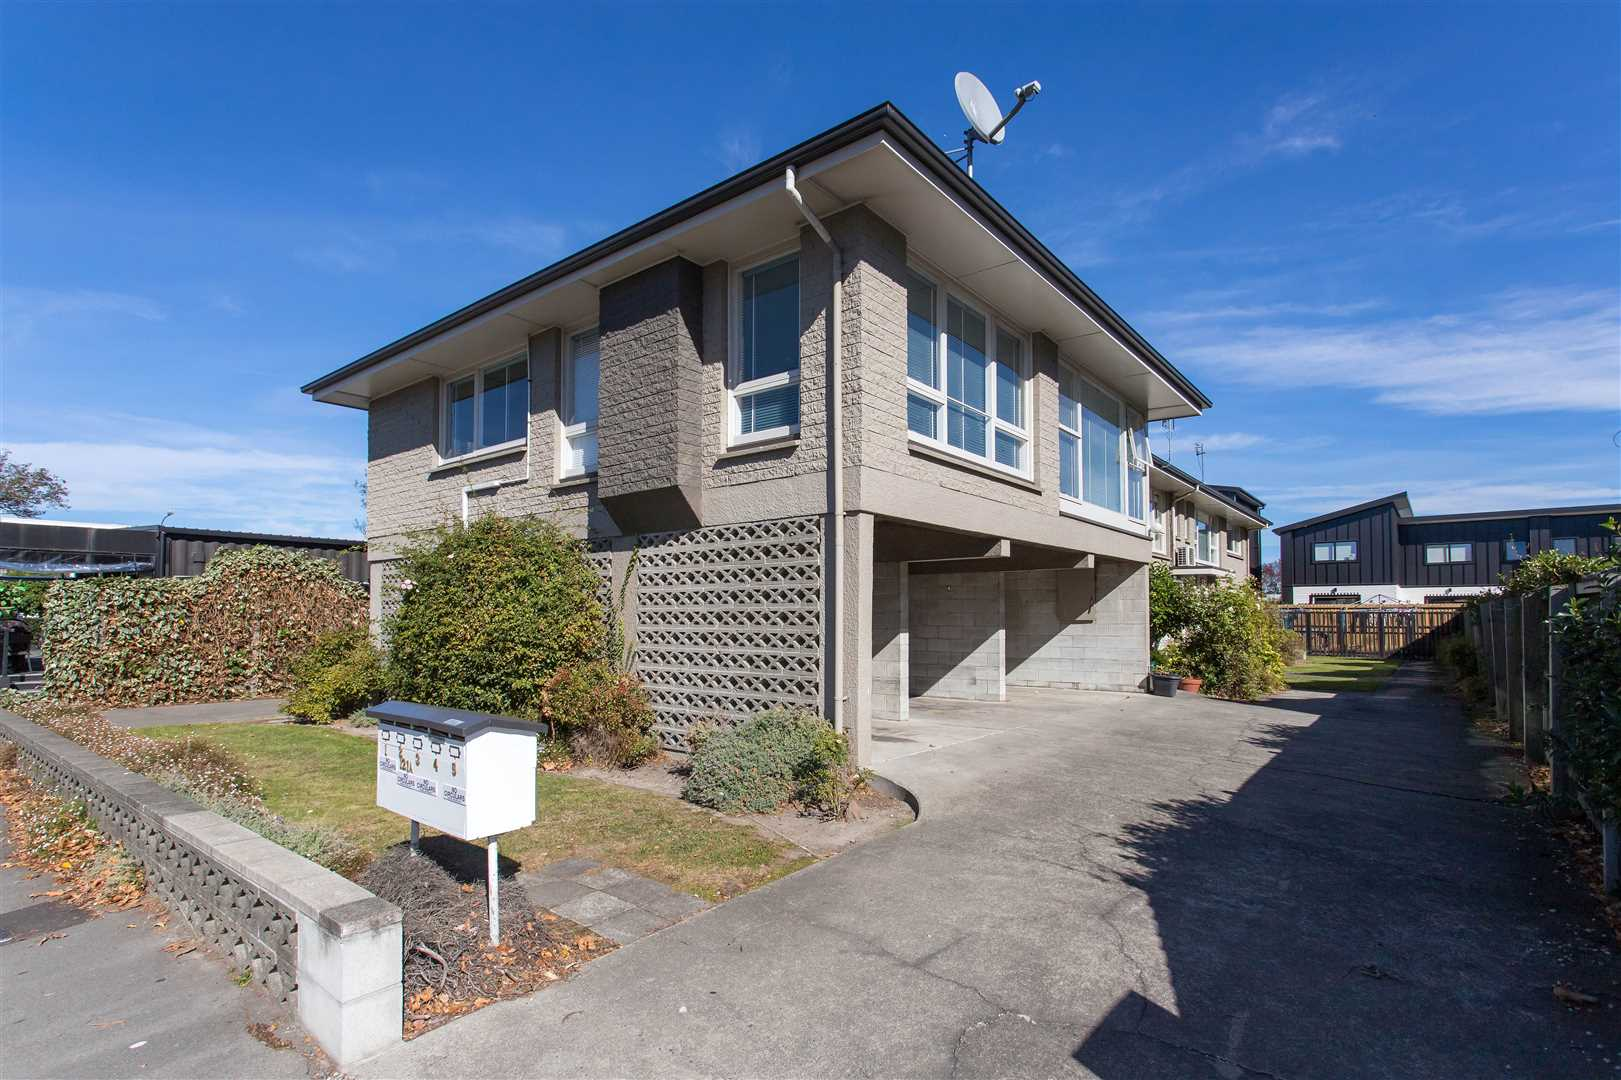 1A/121 Papanui Road, Merivale - Christchurch City